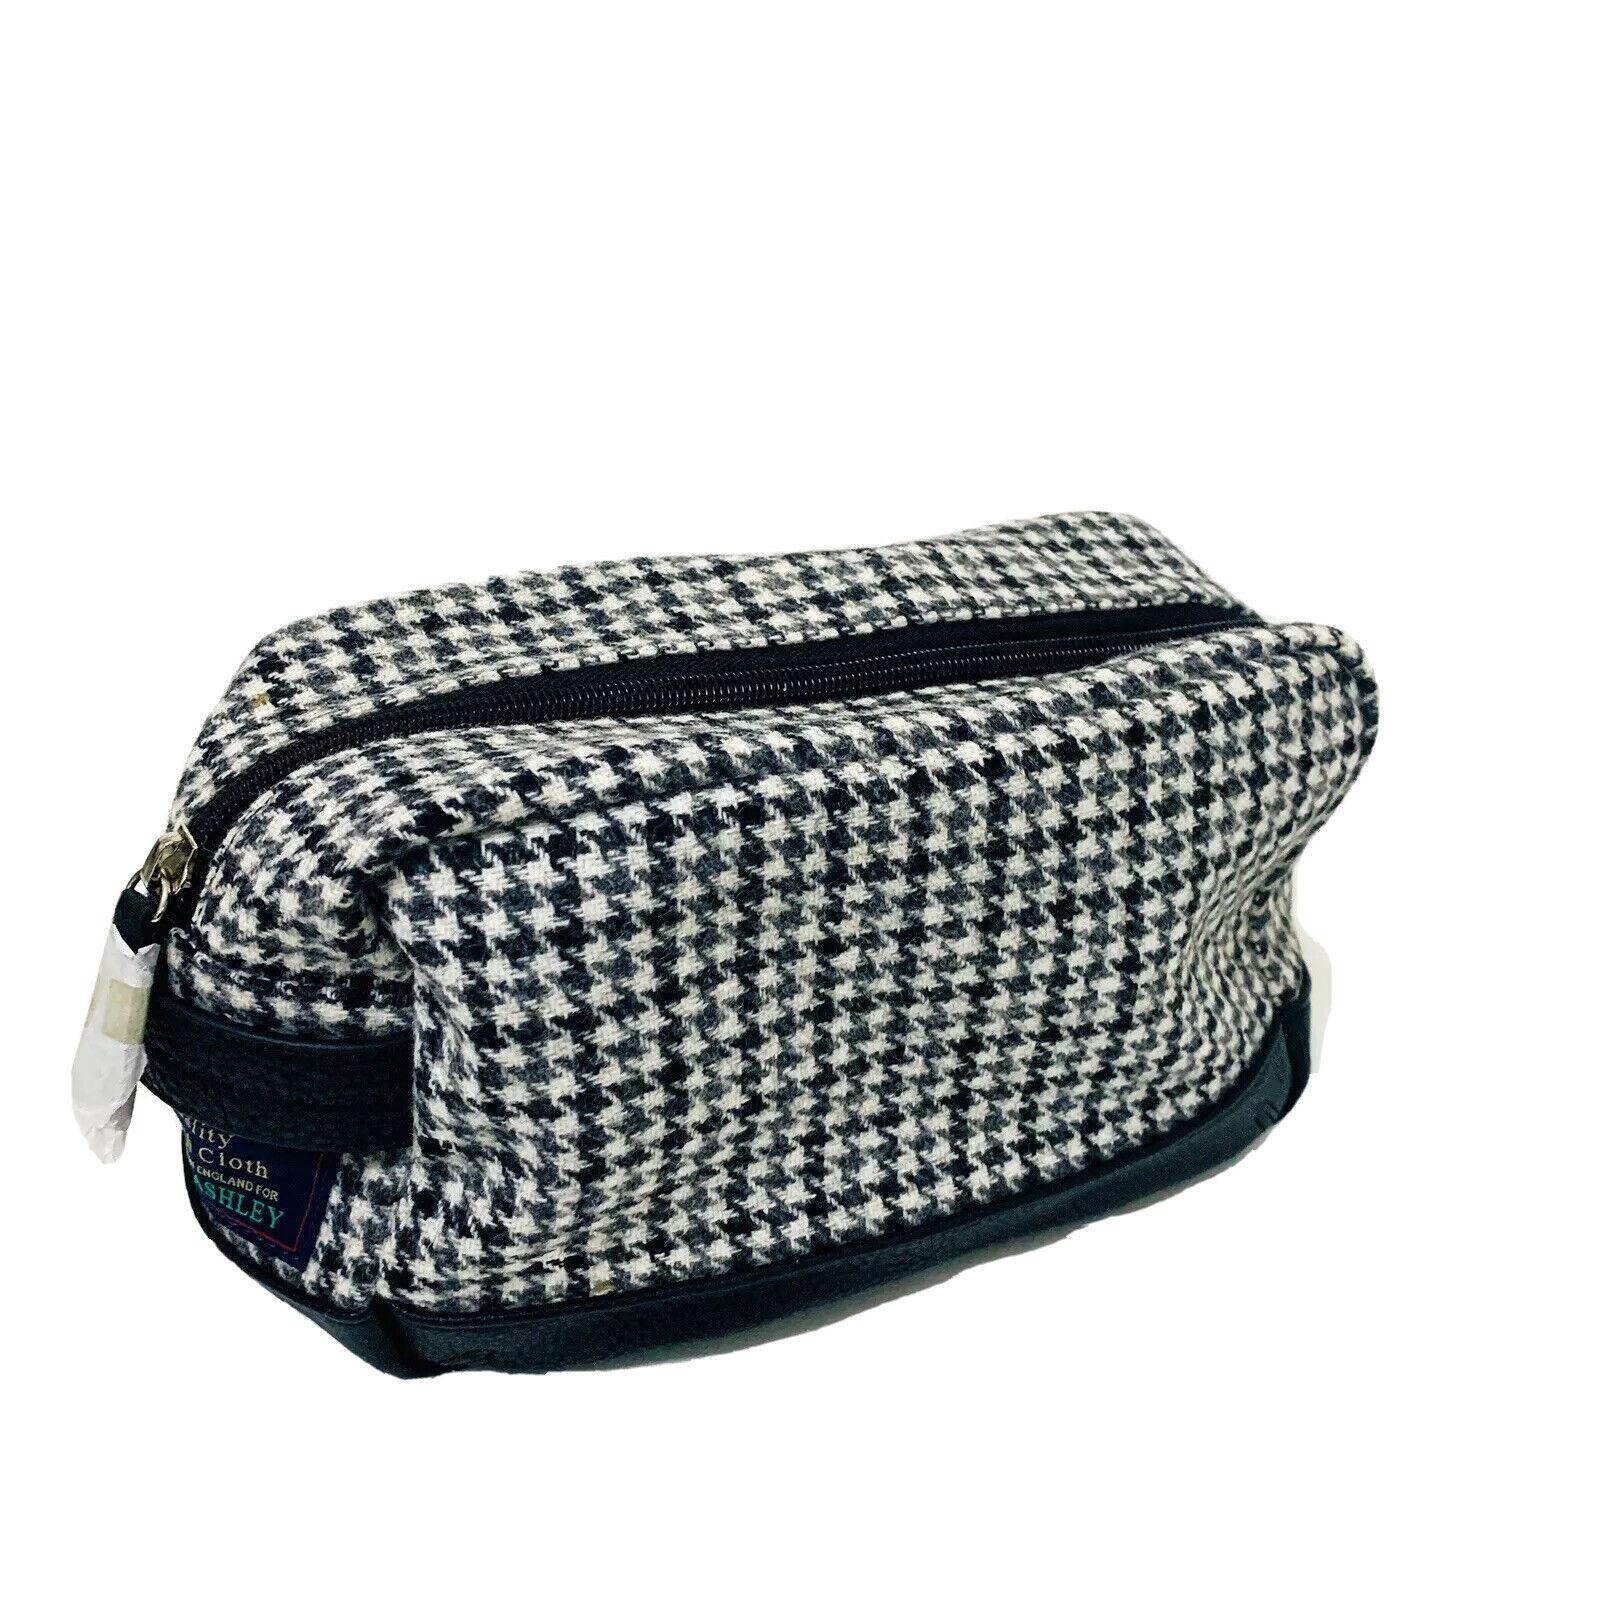 LAURA ASHLEY Black & White Houndstooth Moon Wool Tweed Toiletries Bag Gift NEW